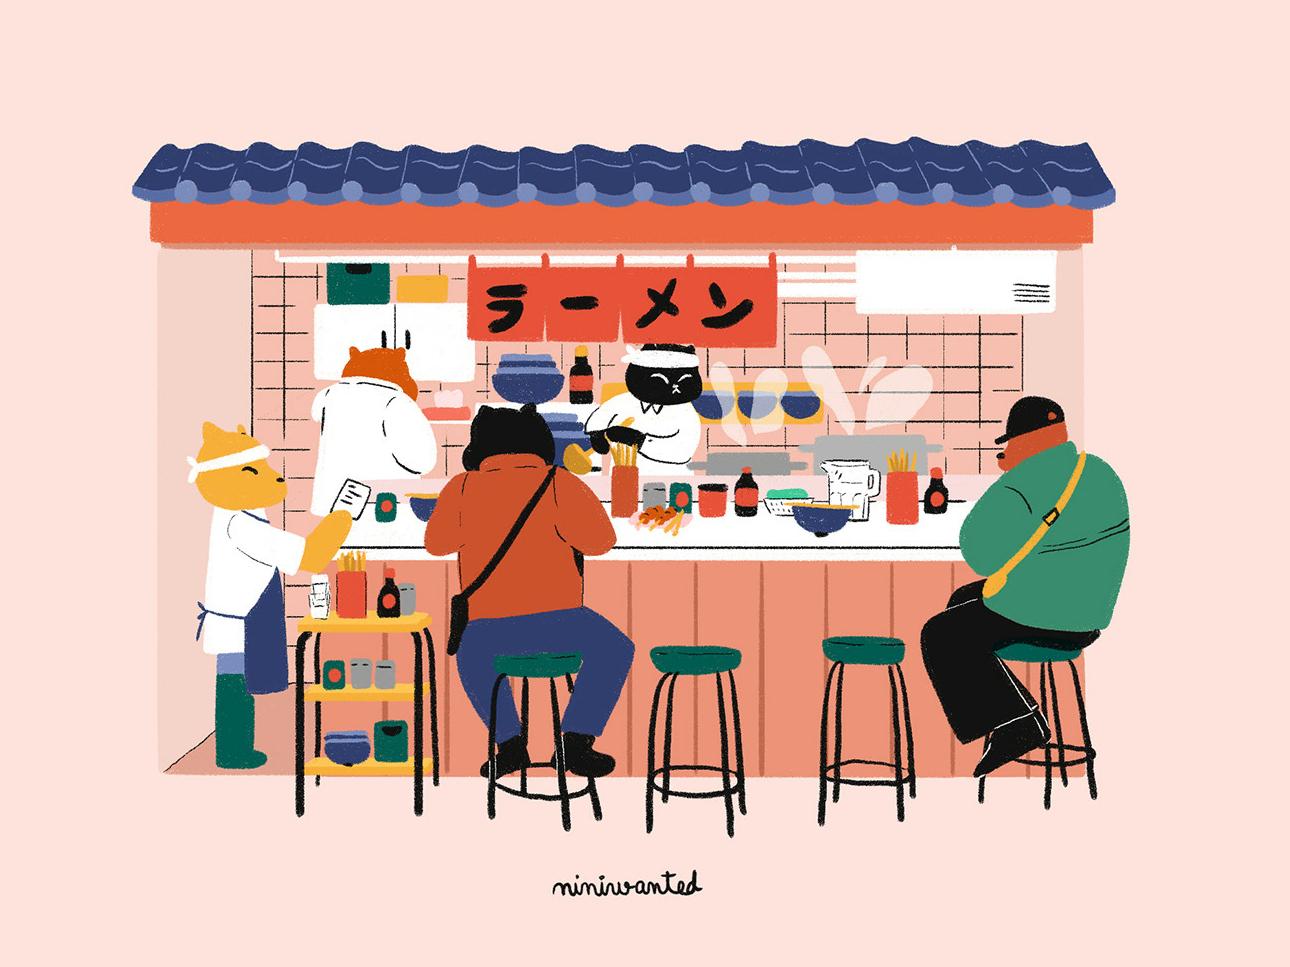 Ramen Stand cute character izakaya eat ramen facade shop illustration food japanese facade cat illustration cat japan